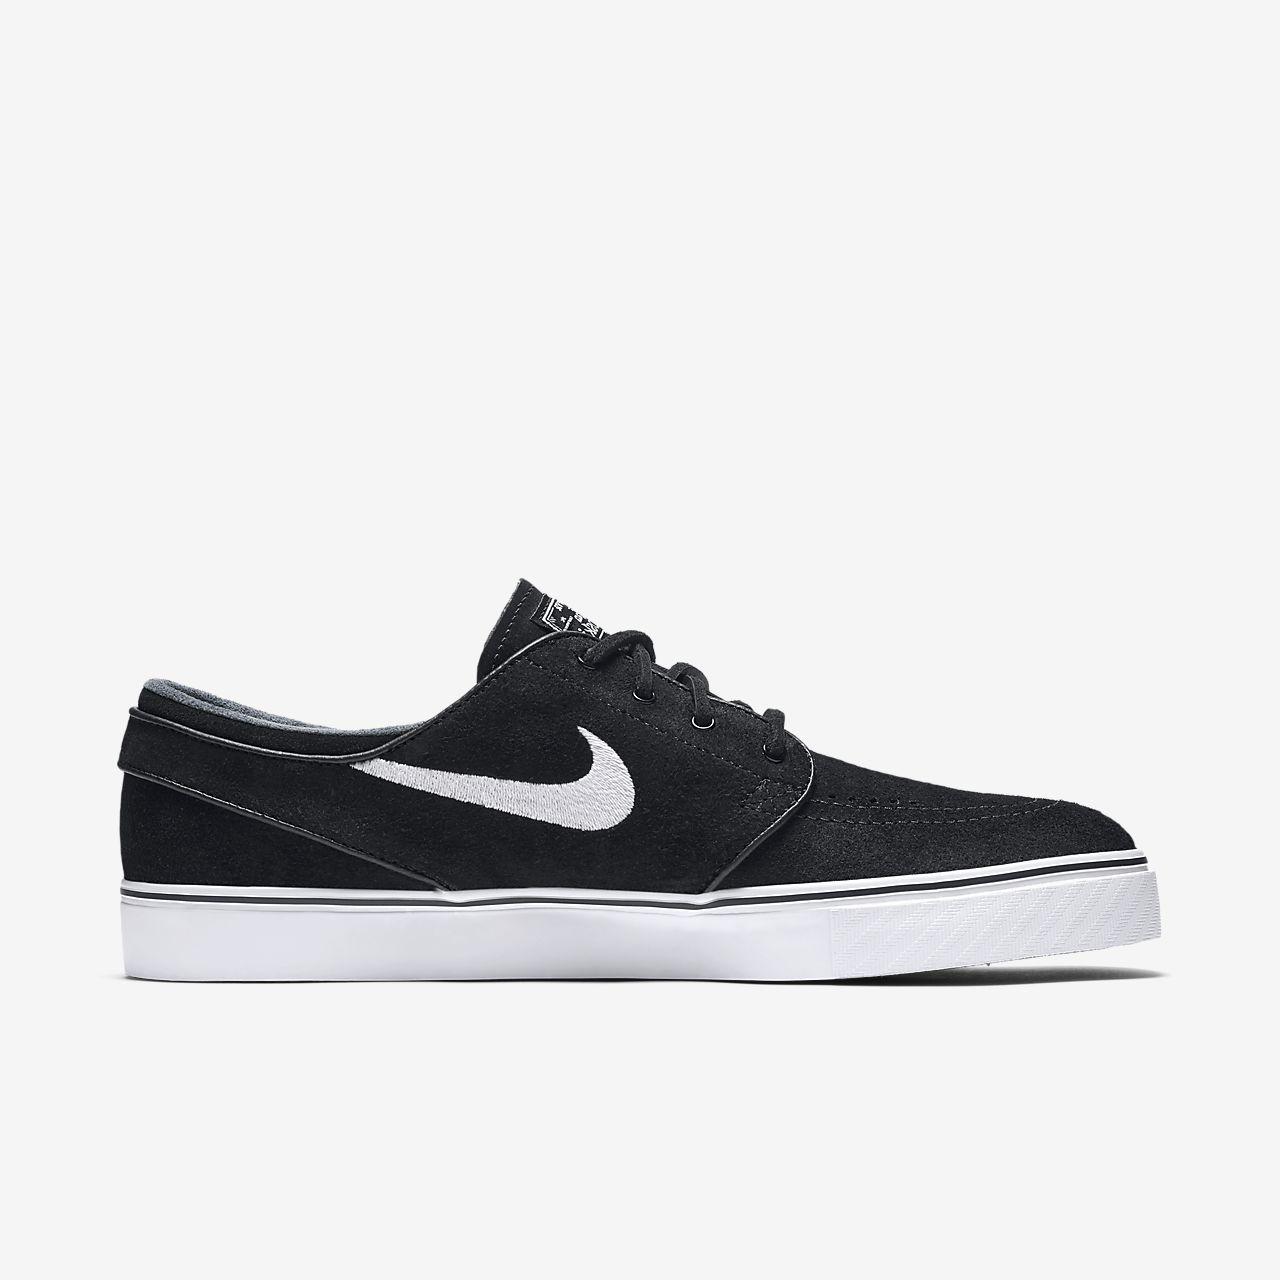 6803035c003a3 Nike SB Zoom Stefan Janoski OG Men s Skate Shoe. Nike.com CA